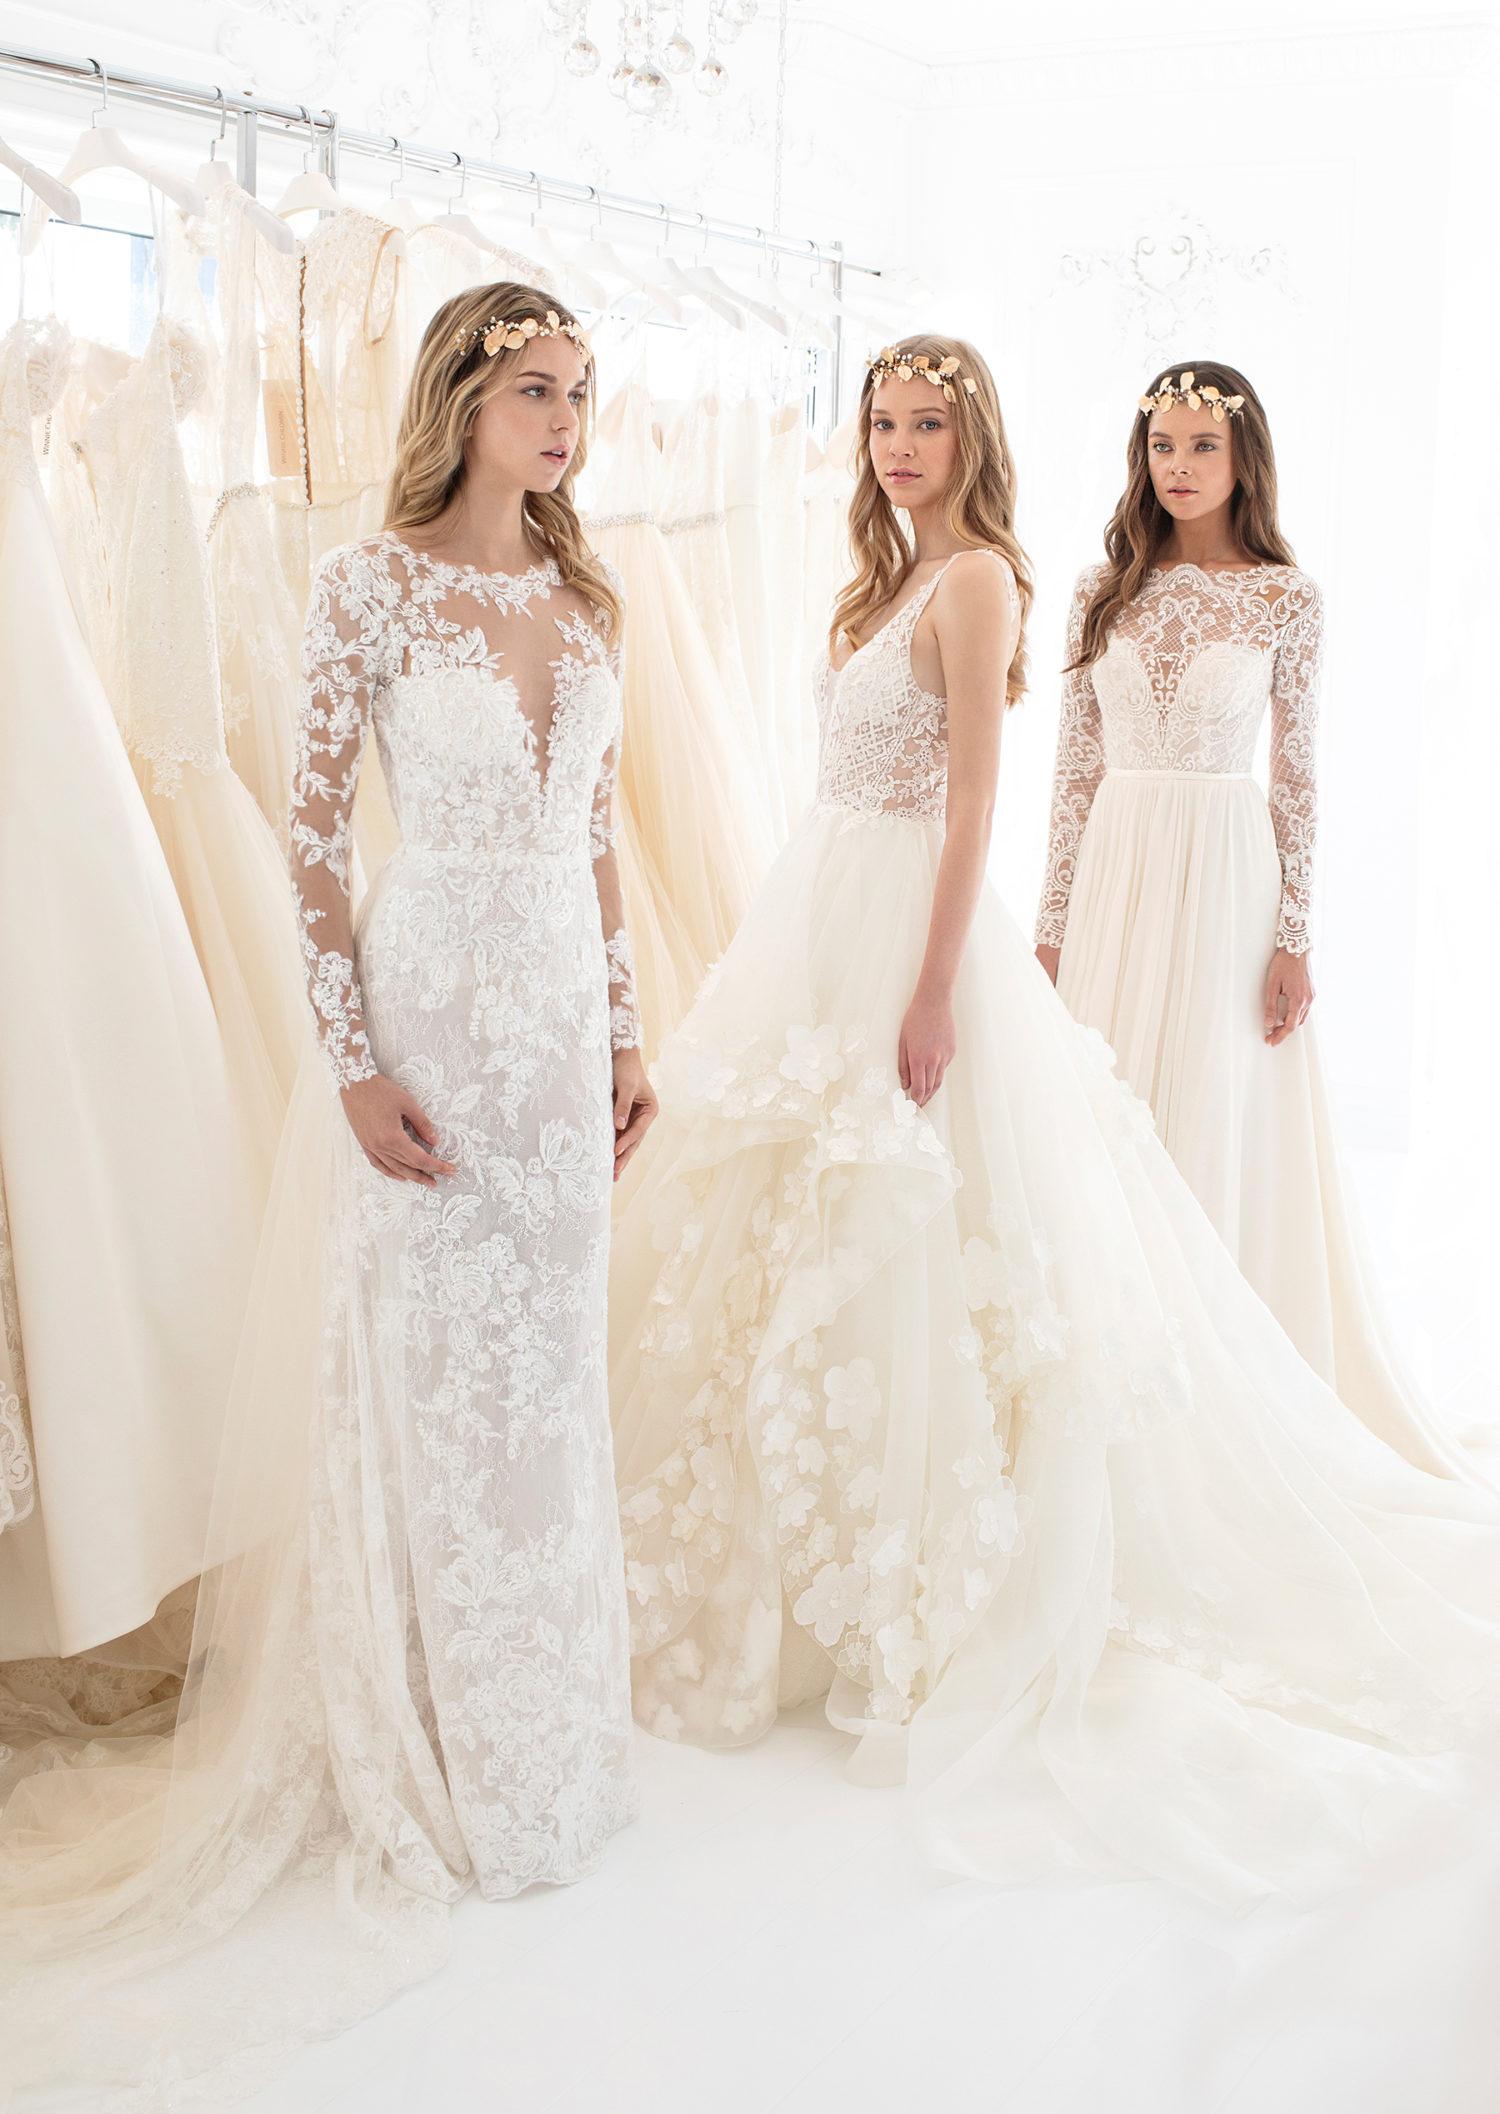 WEDDING DRESS MAEVE 3269